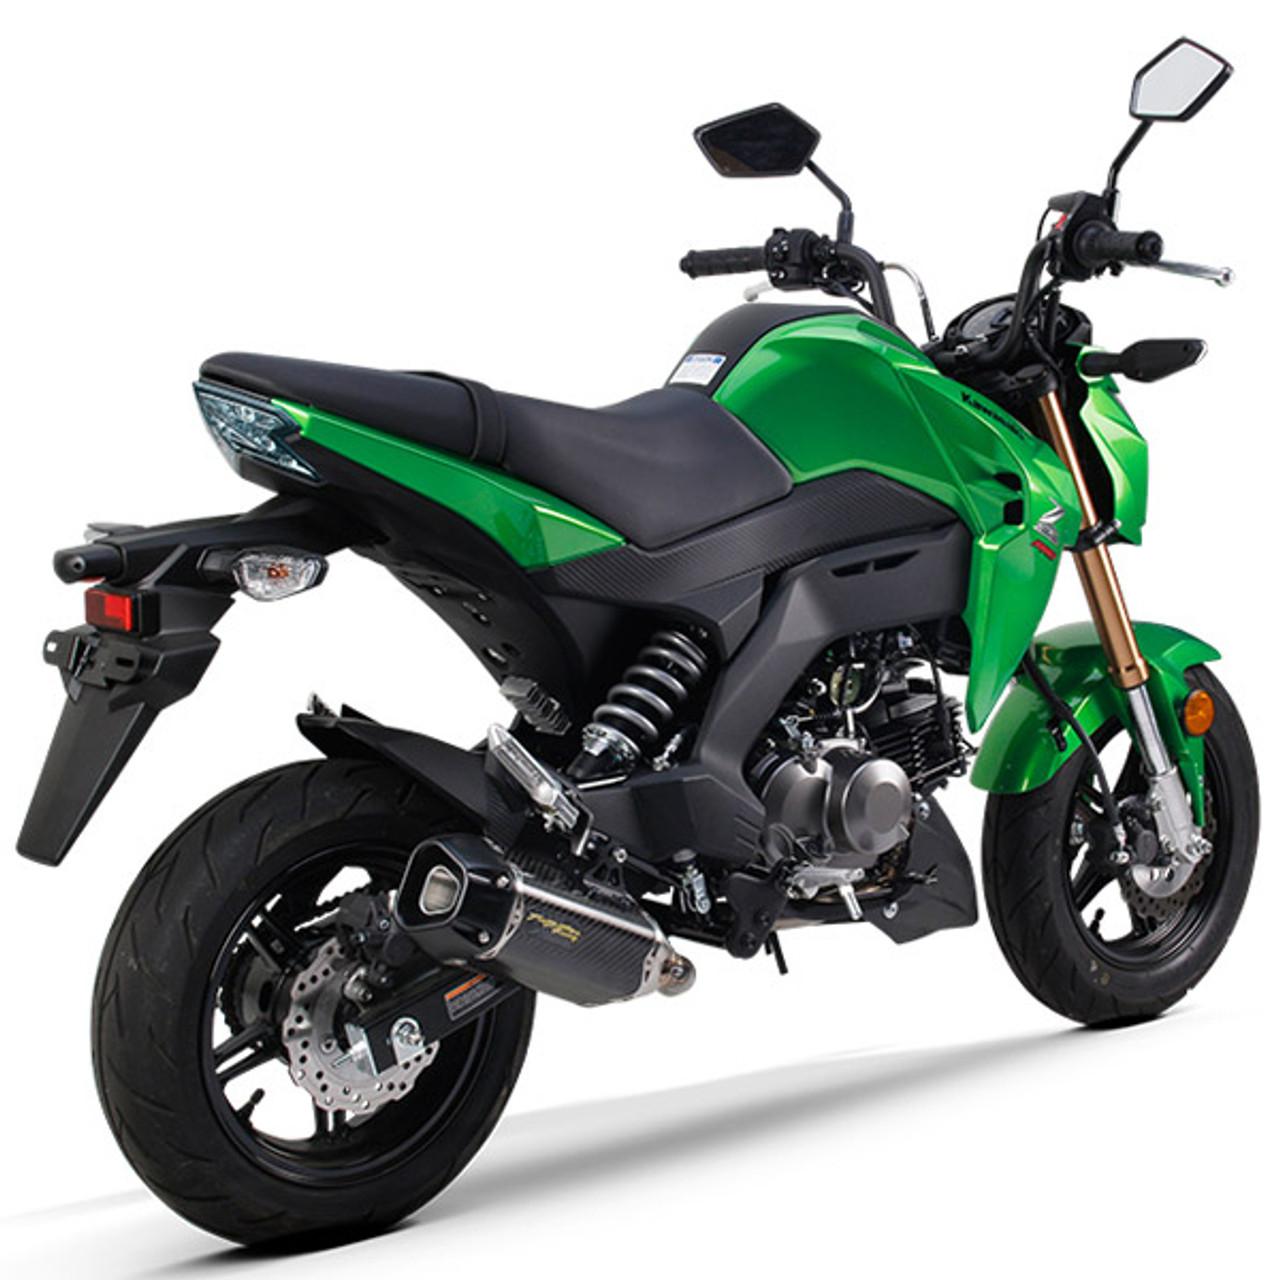 2017 Kawasaki Z125 Pro >> Two Brothers Kawasaki Z125 Pro 17 19 Tarmac Full Exhaust System